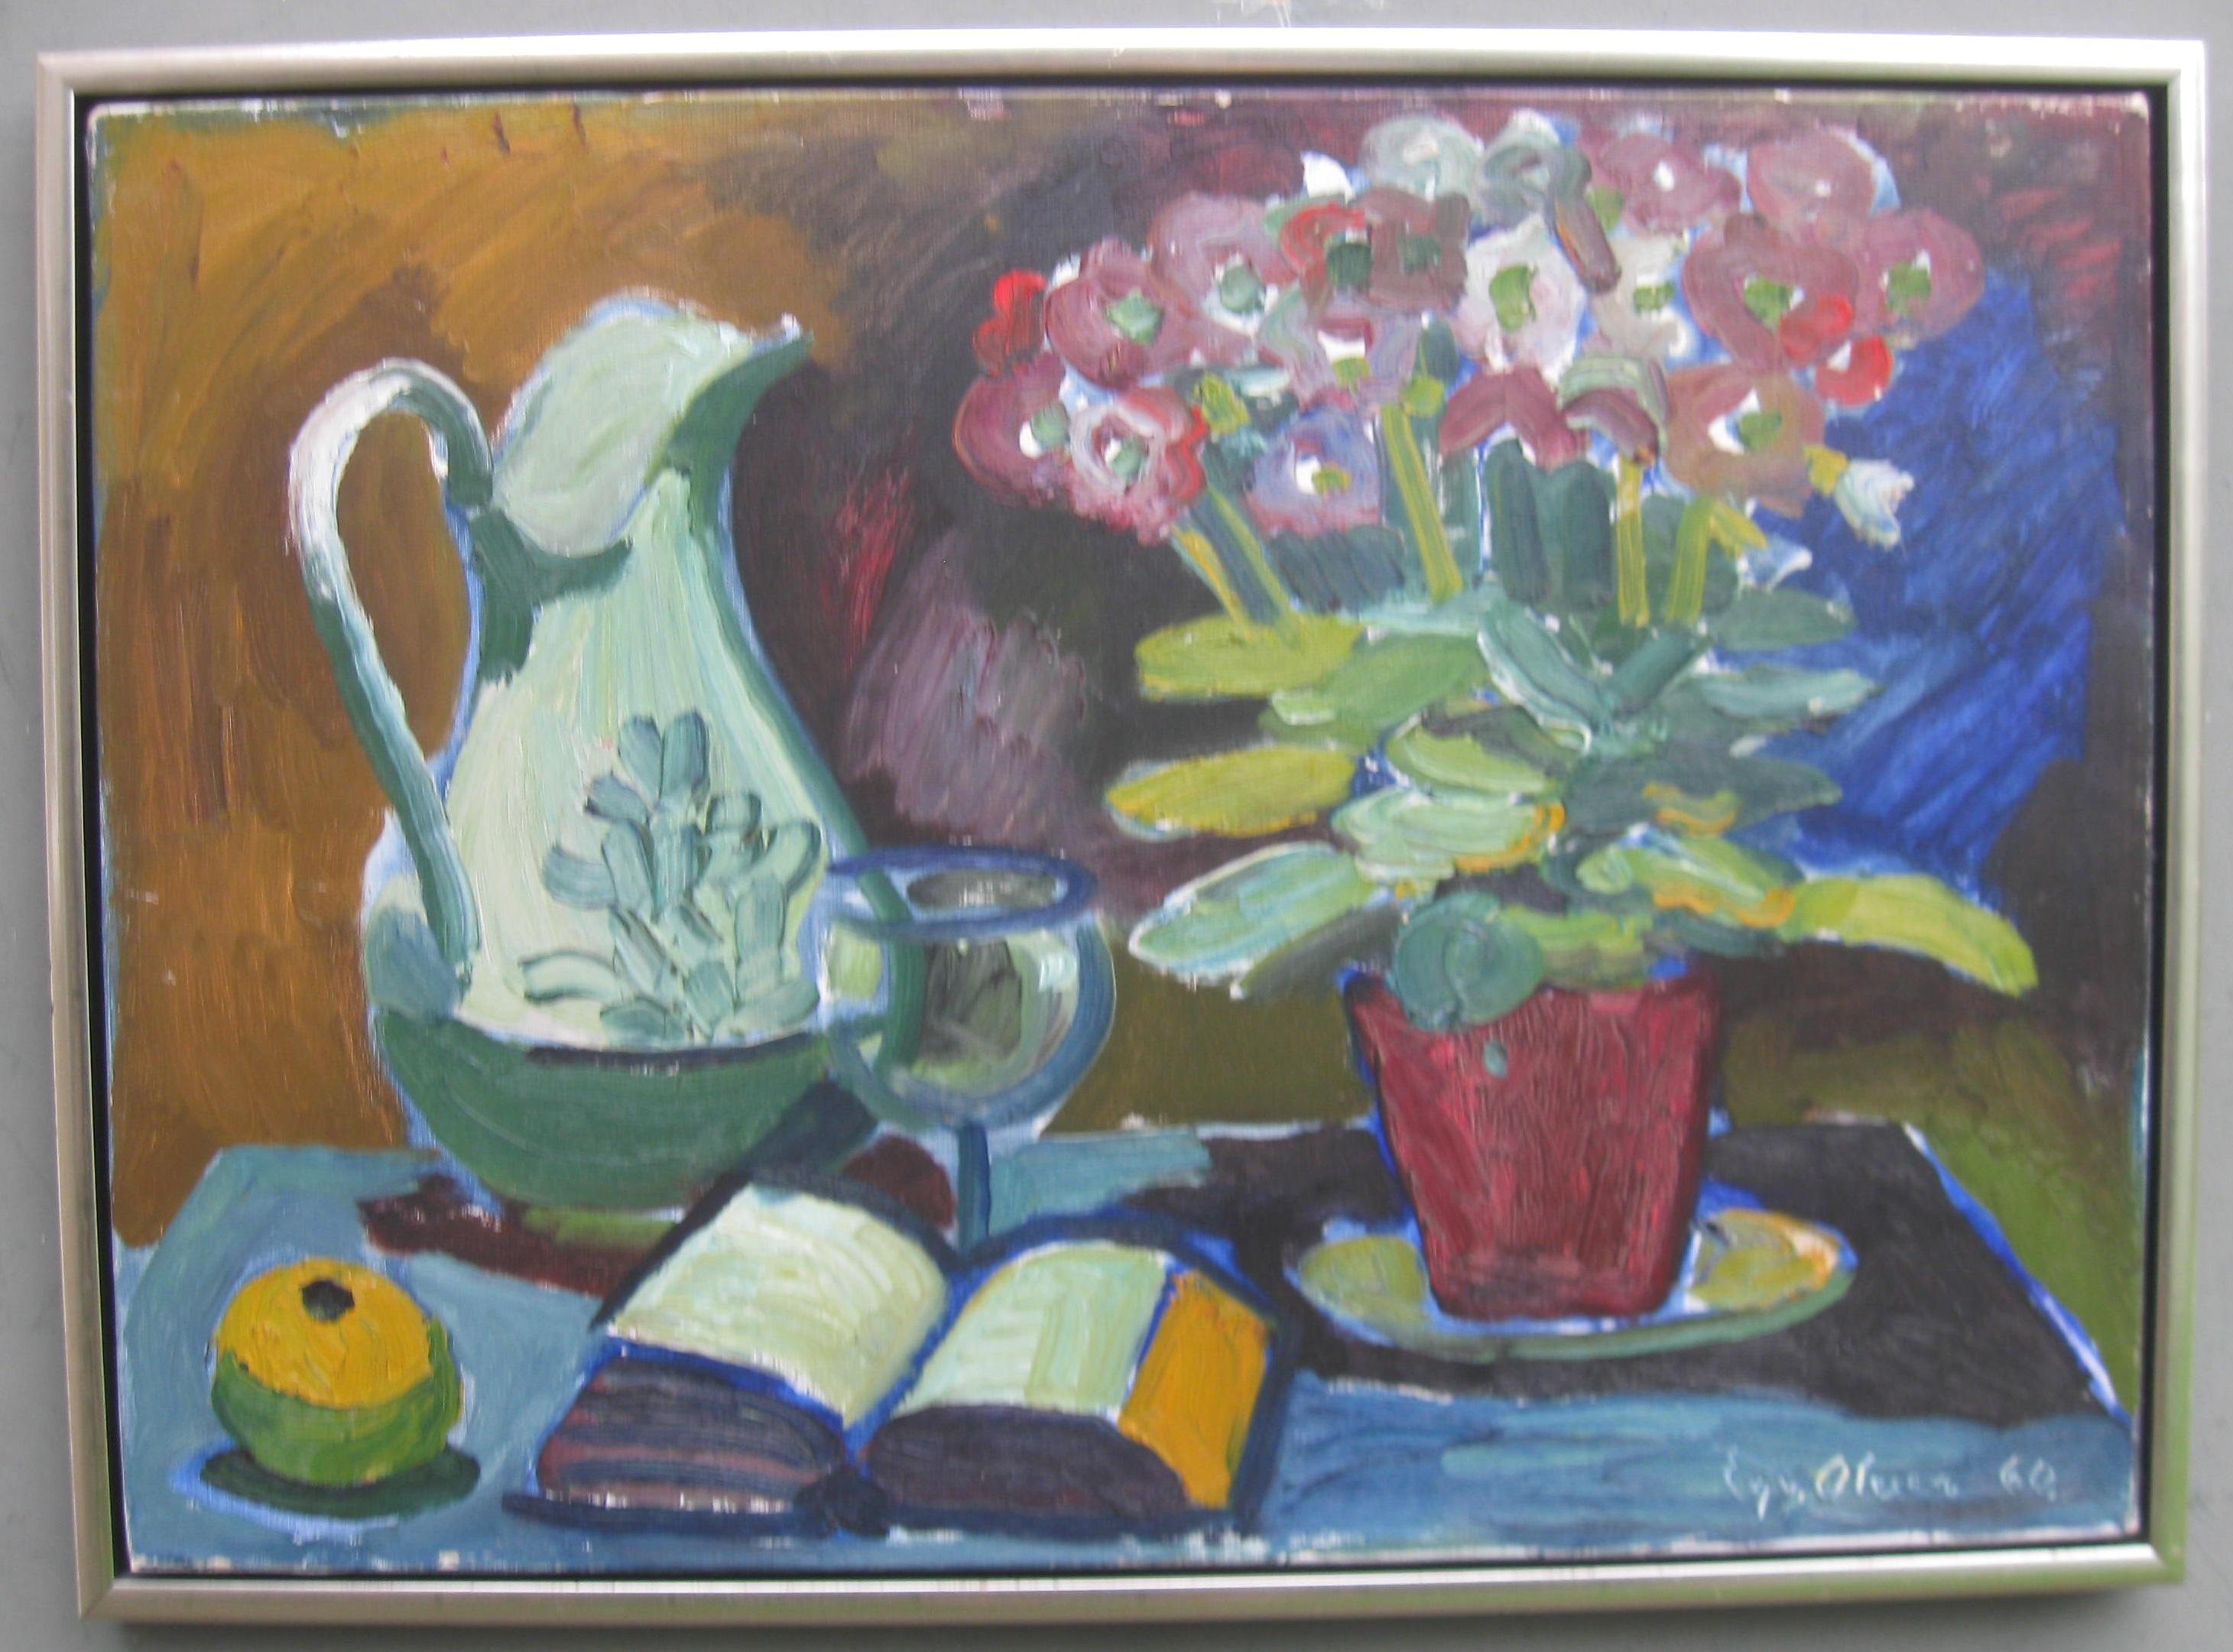 Mid 20thCentury Modernist/Expressionist Still Life oil c1960